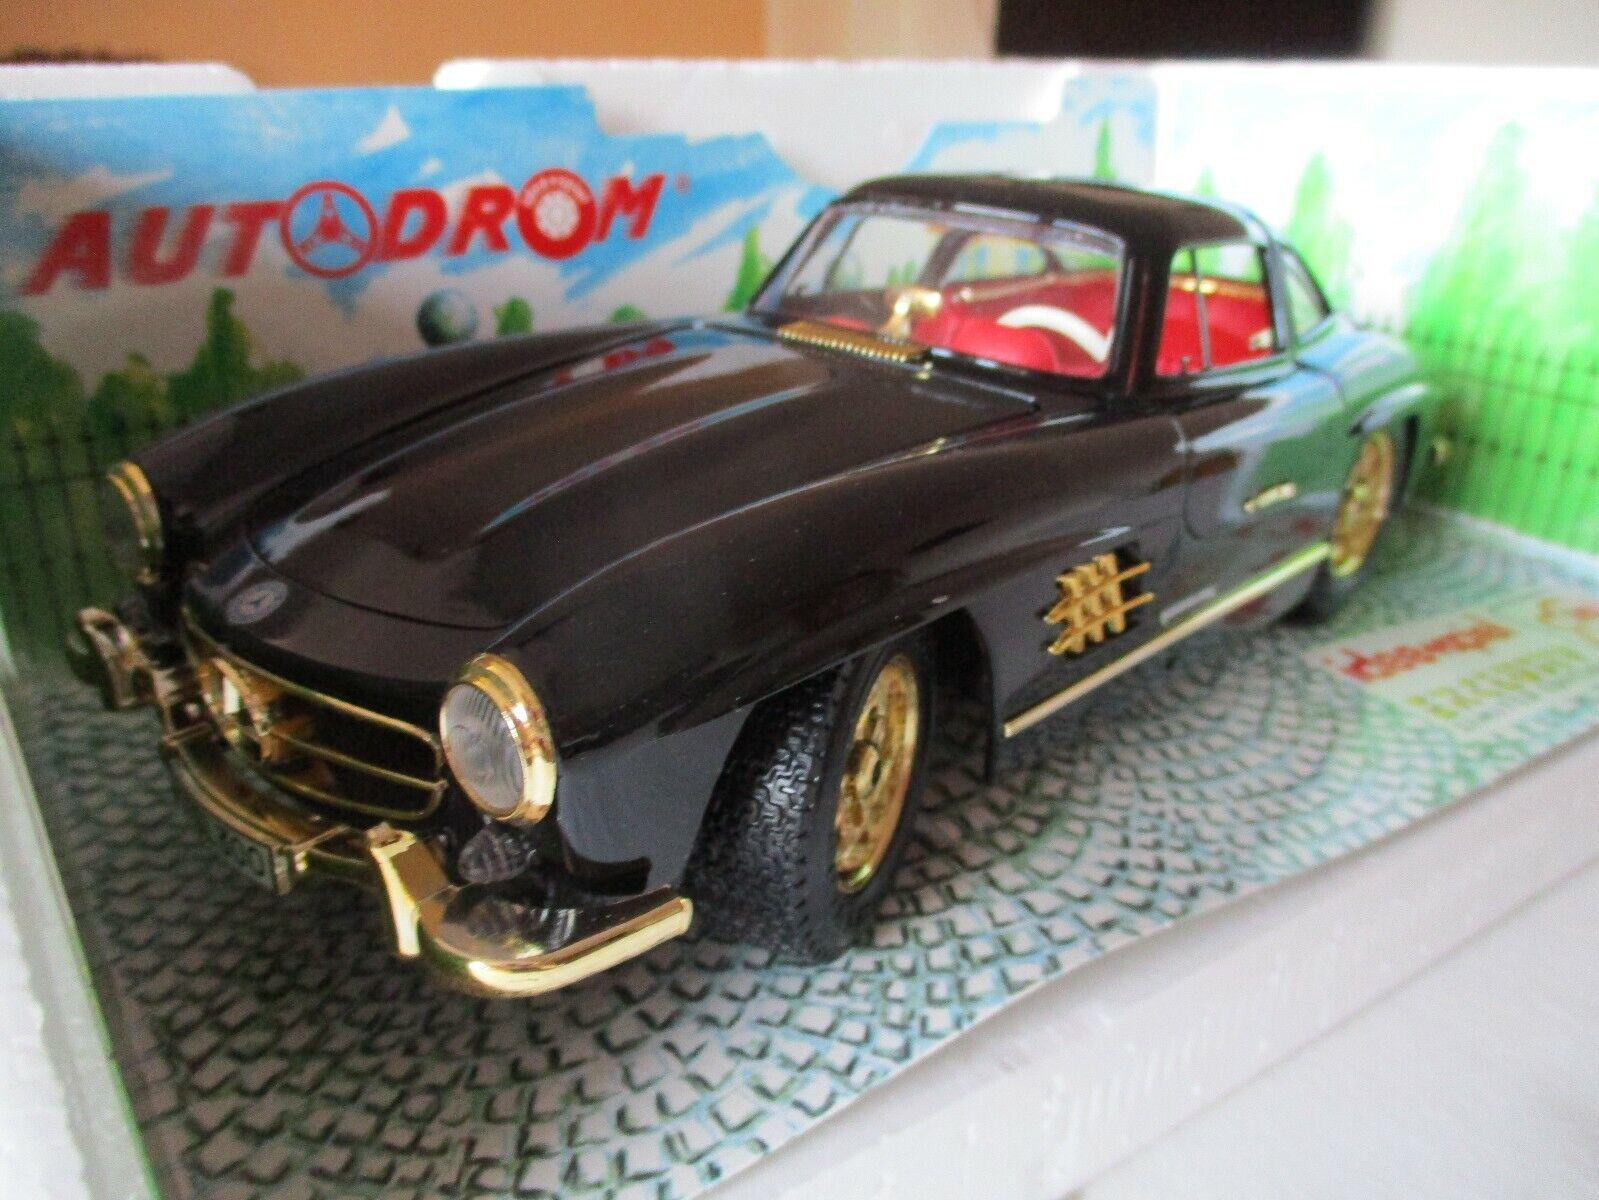 Burago 1 18 Mercedes 300 SL (1954) 3015 Die-Cast Model Car Boxed Black gold